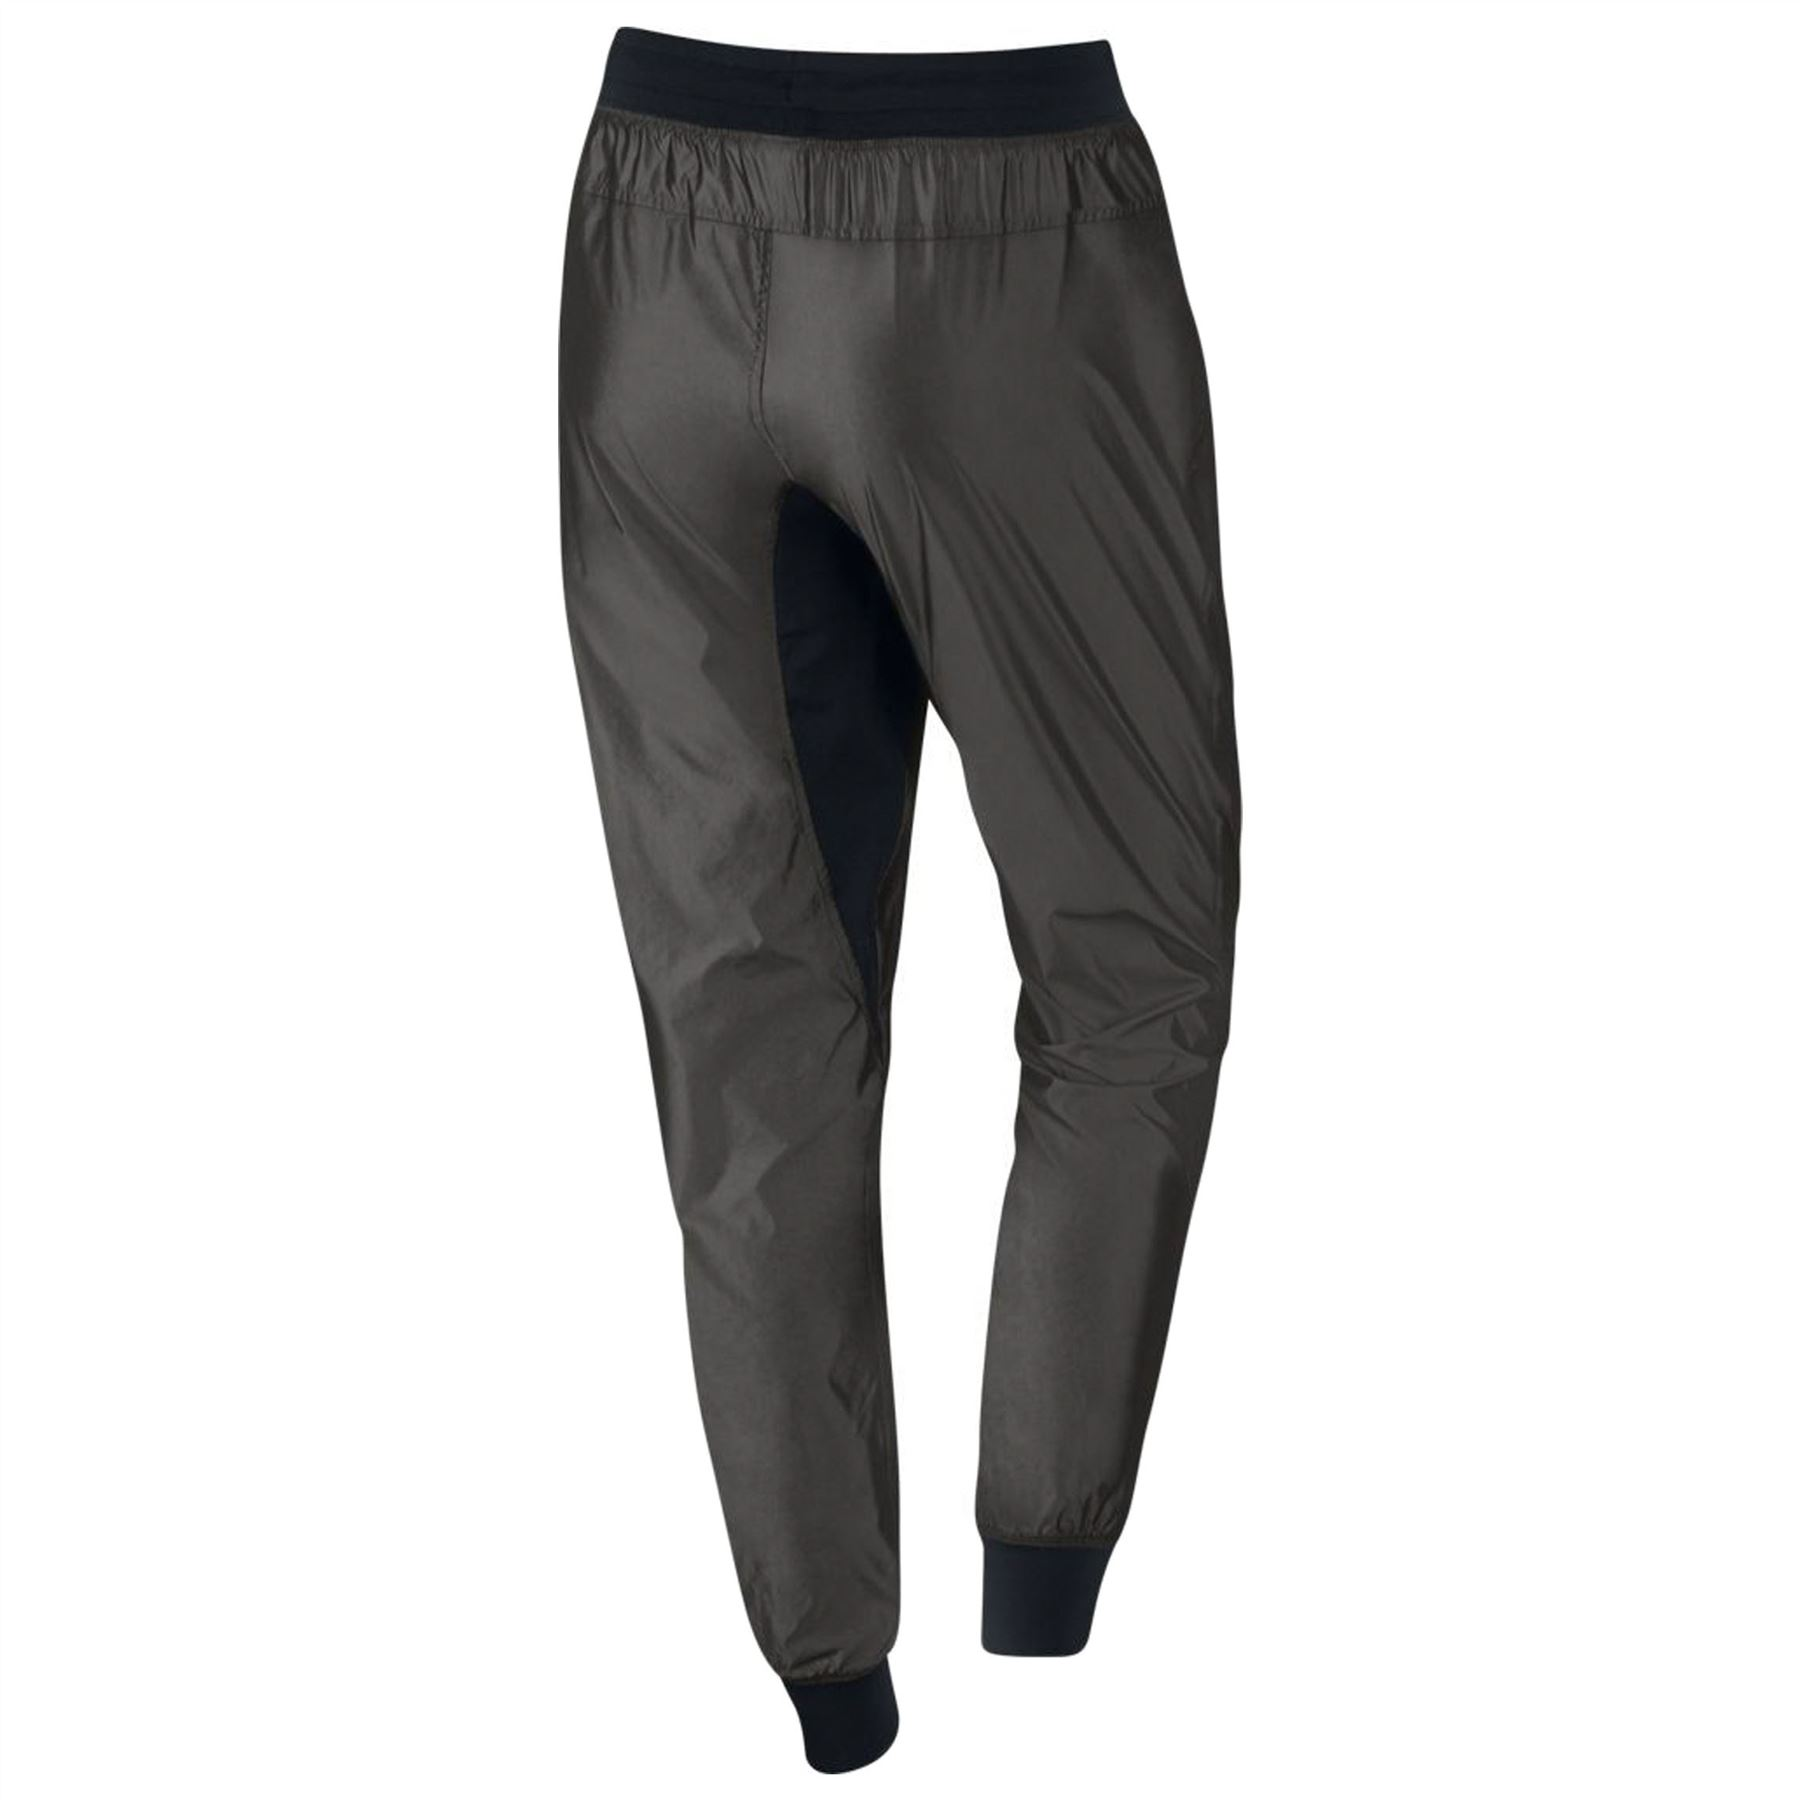 Innovative Nike Sportswear Gym Vintage Training Pants Women  Grey White Buy